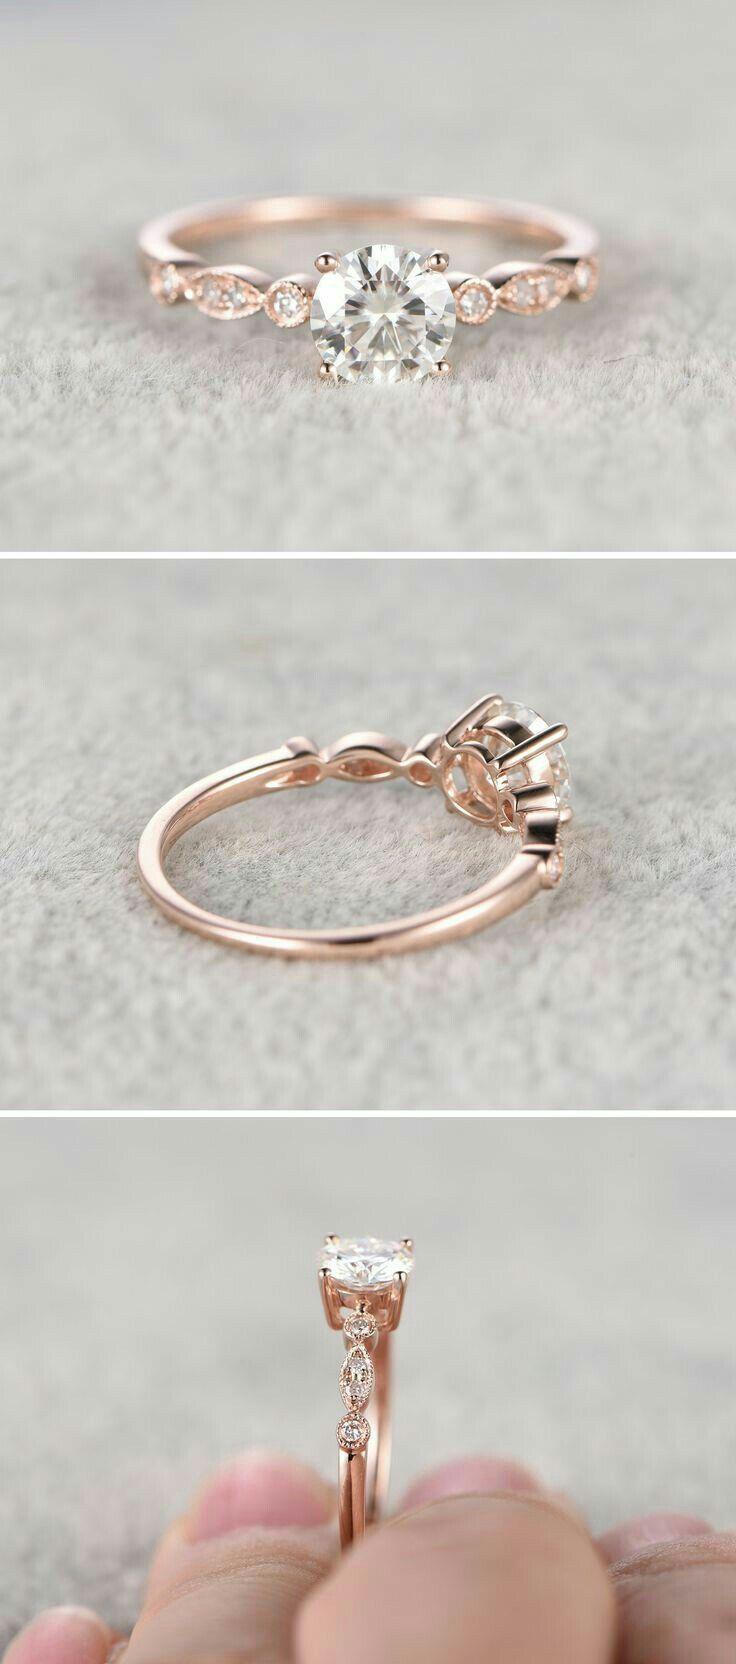 Best 25+ Promise rings ideas on Pinterest | Dainty ...